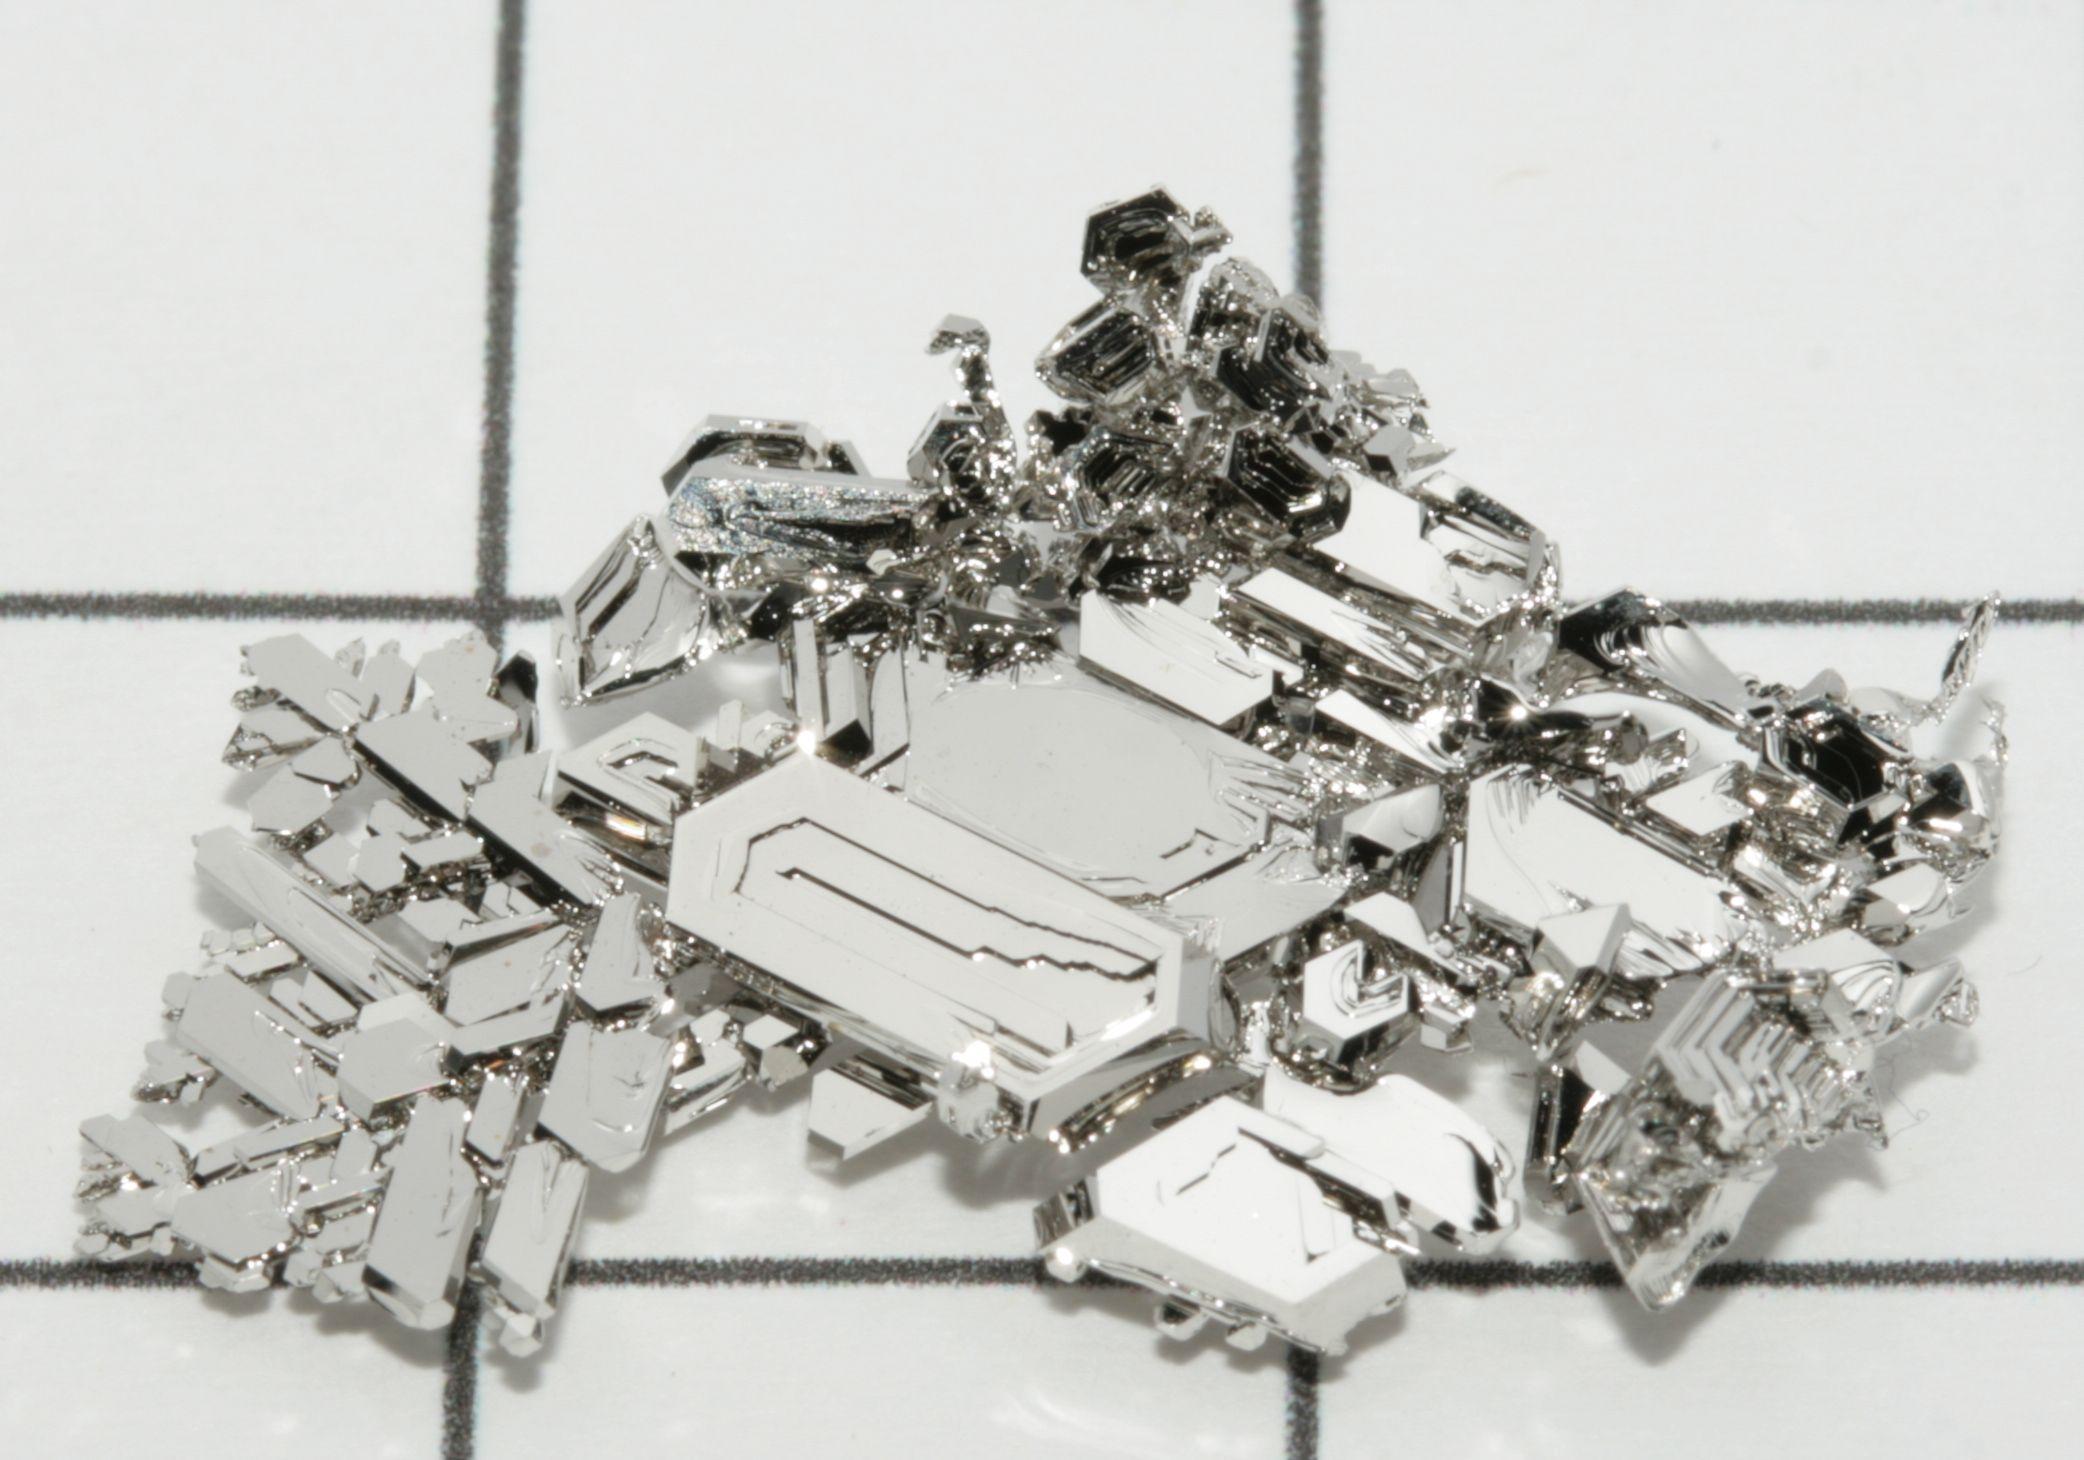 Platinum - Wikipedia